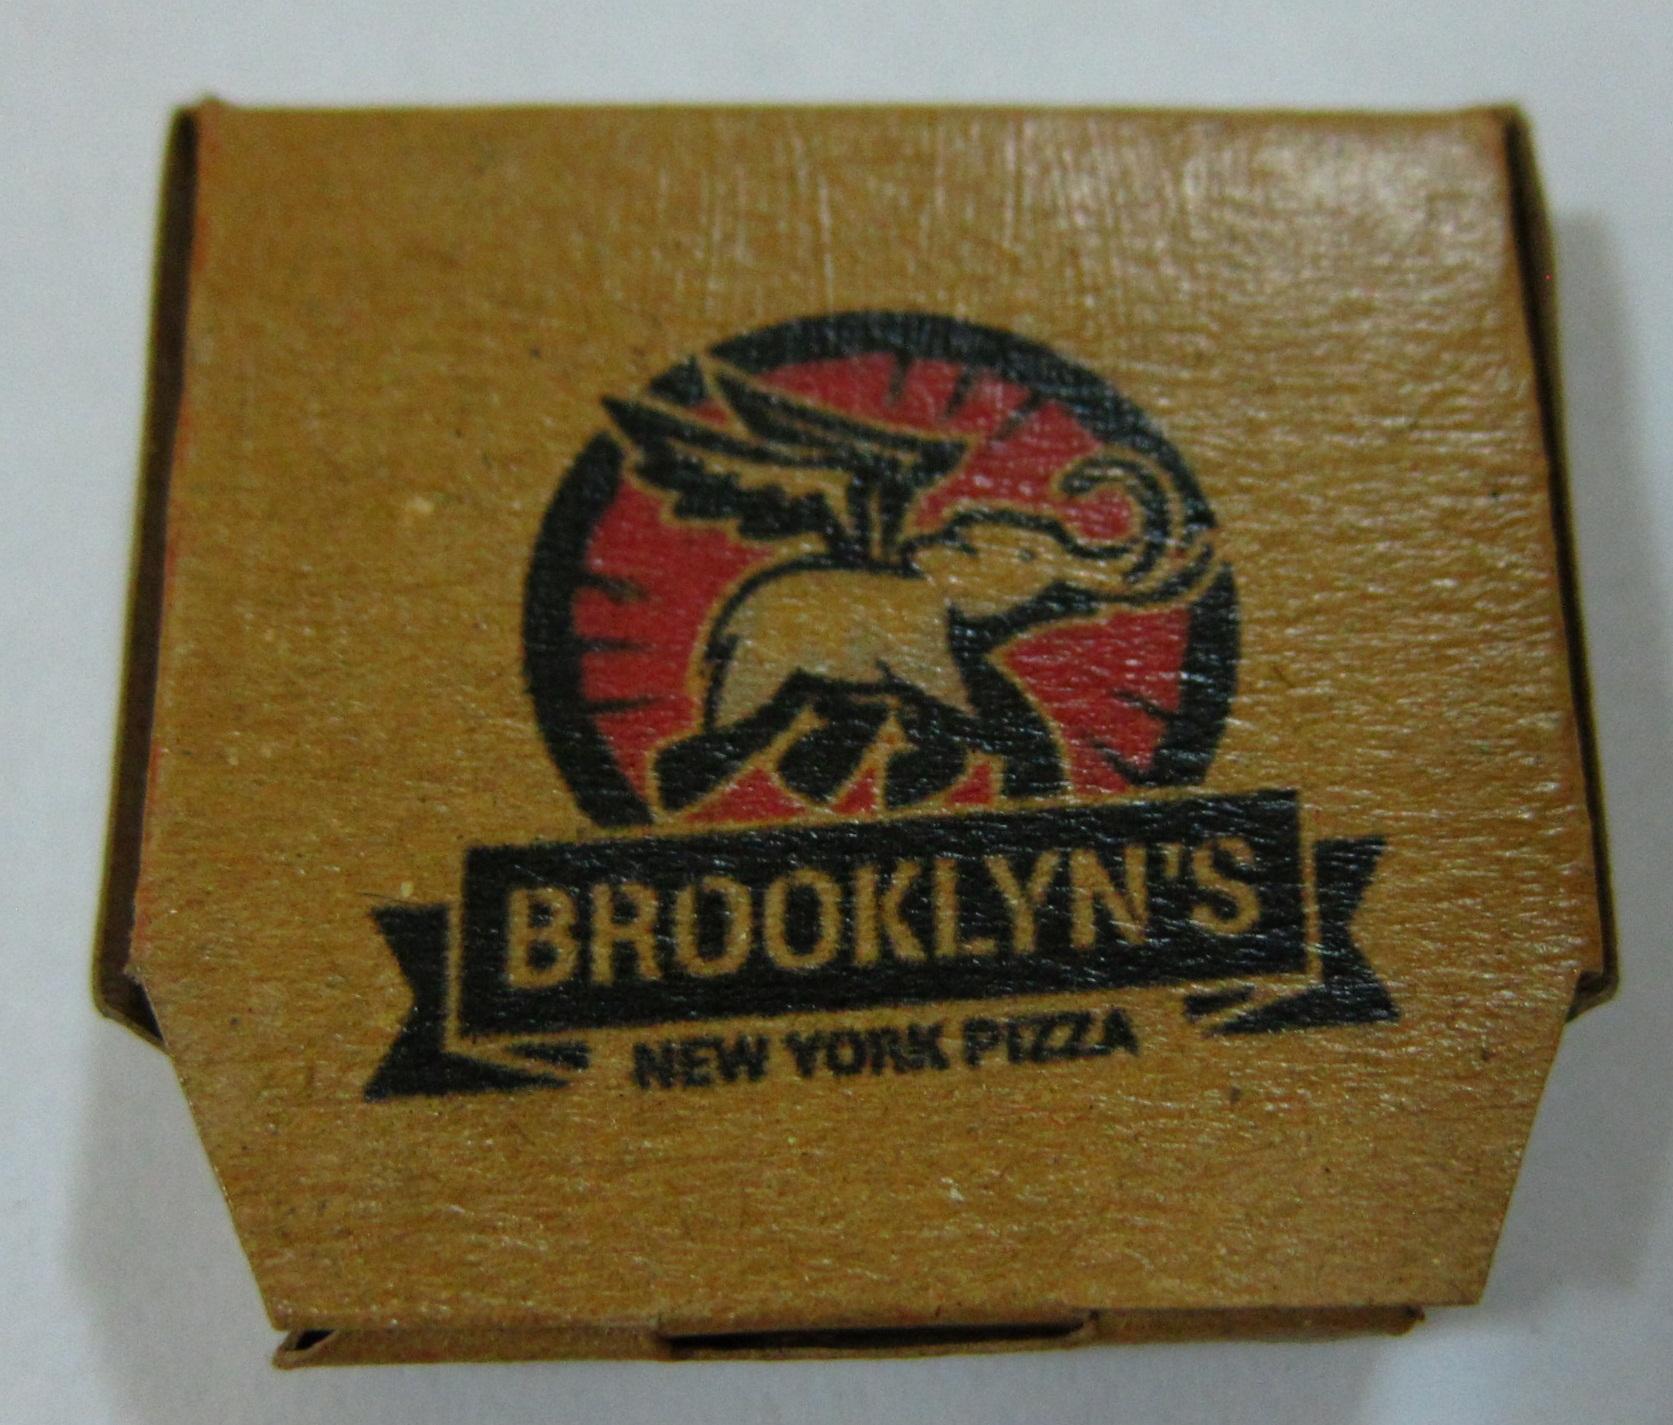 La Filipizza by Brooklyn's New York Pizza